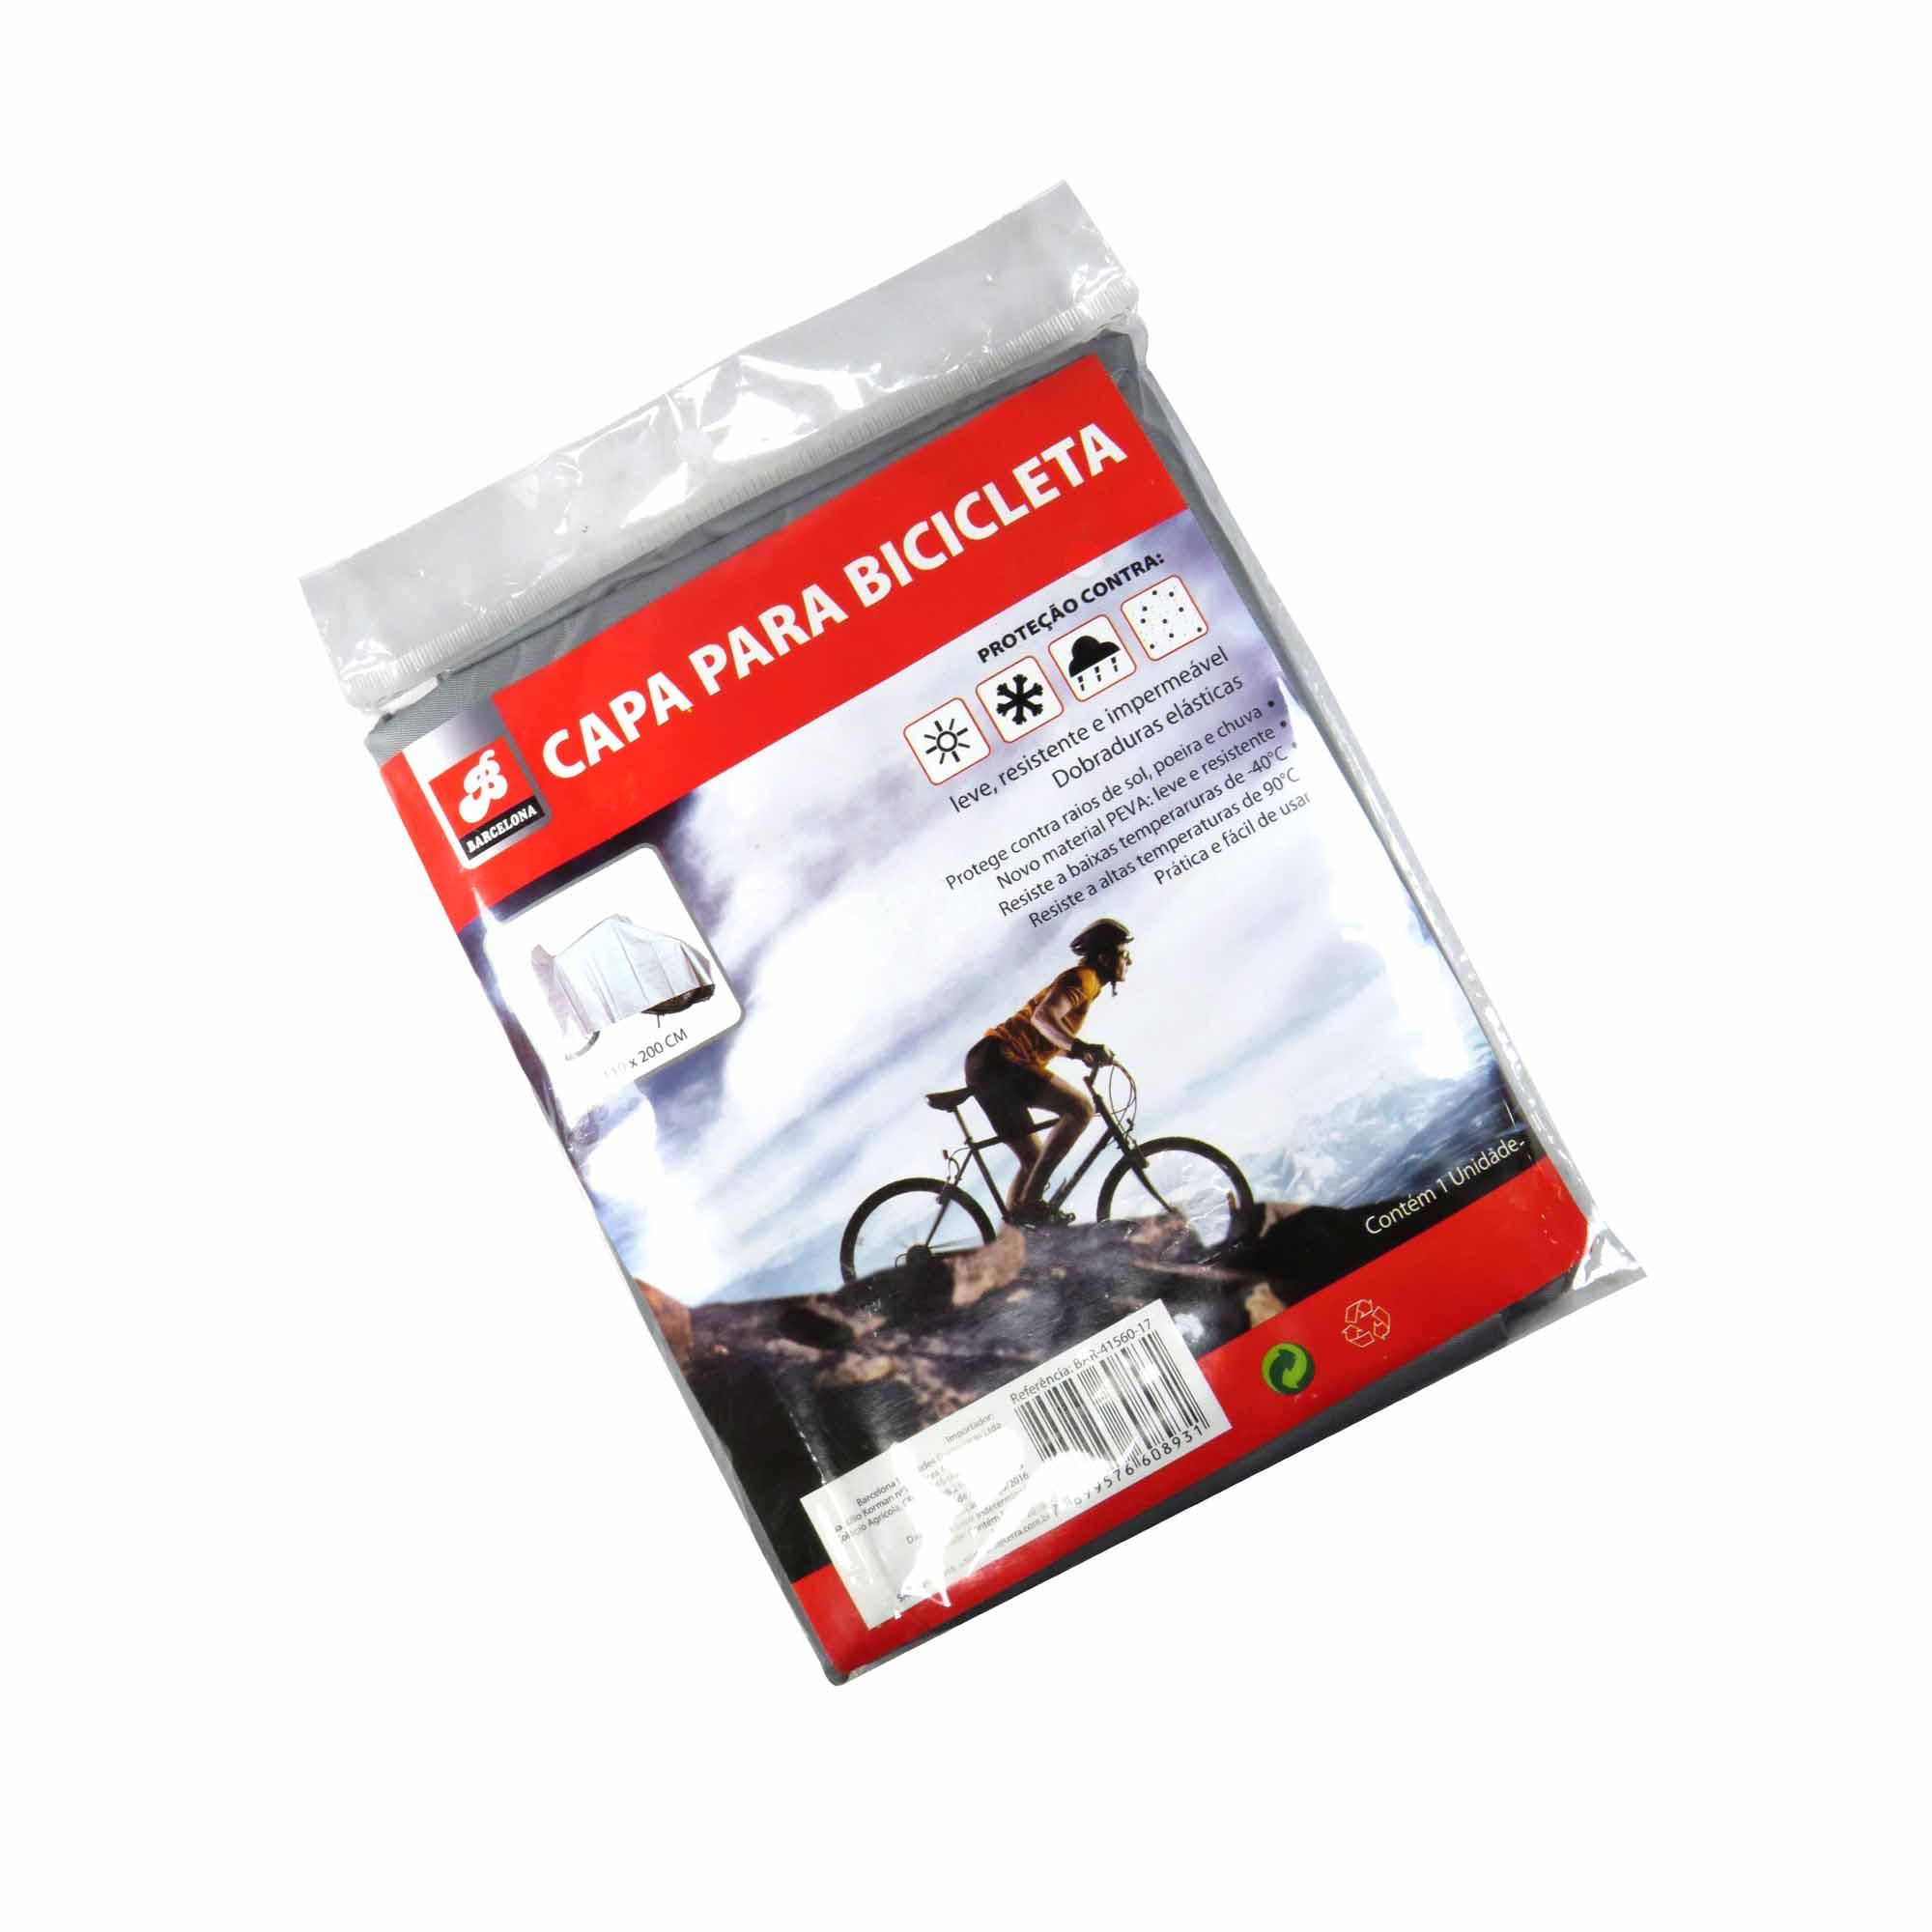 Capa Para Bicicleta 110 x 200 cm Impermeável Leve Barcelona